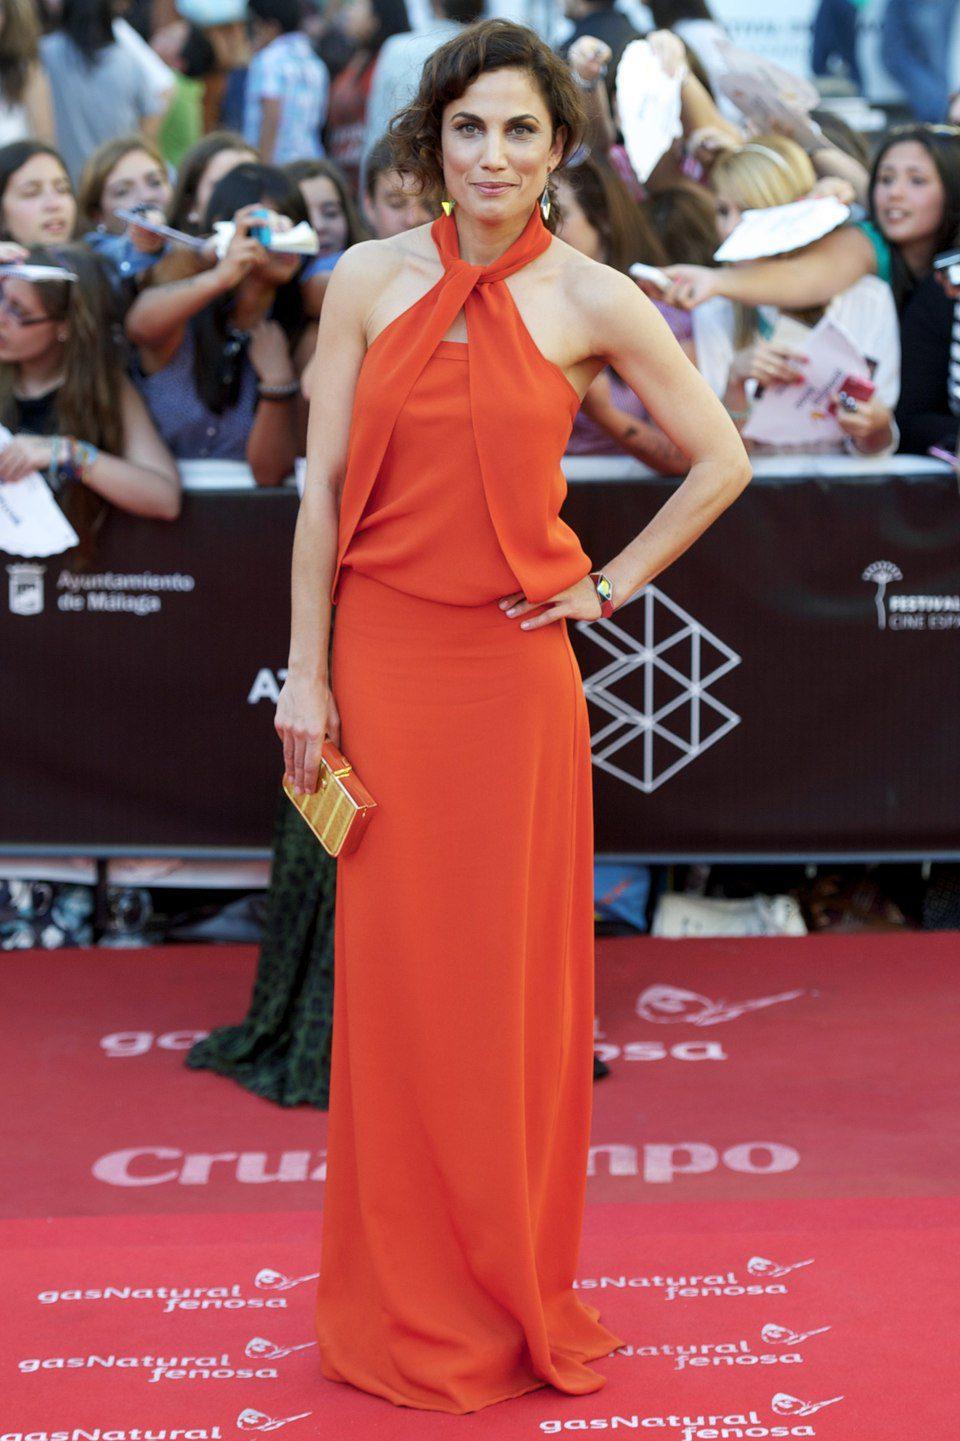 Toni Acosta en la clausura del Festival de Málaga 2013